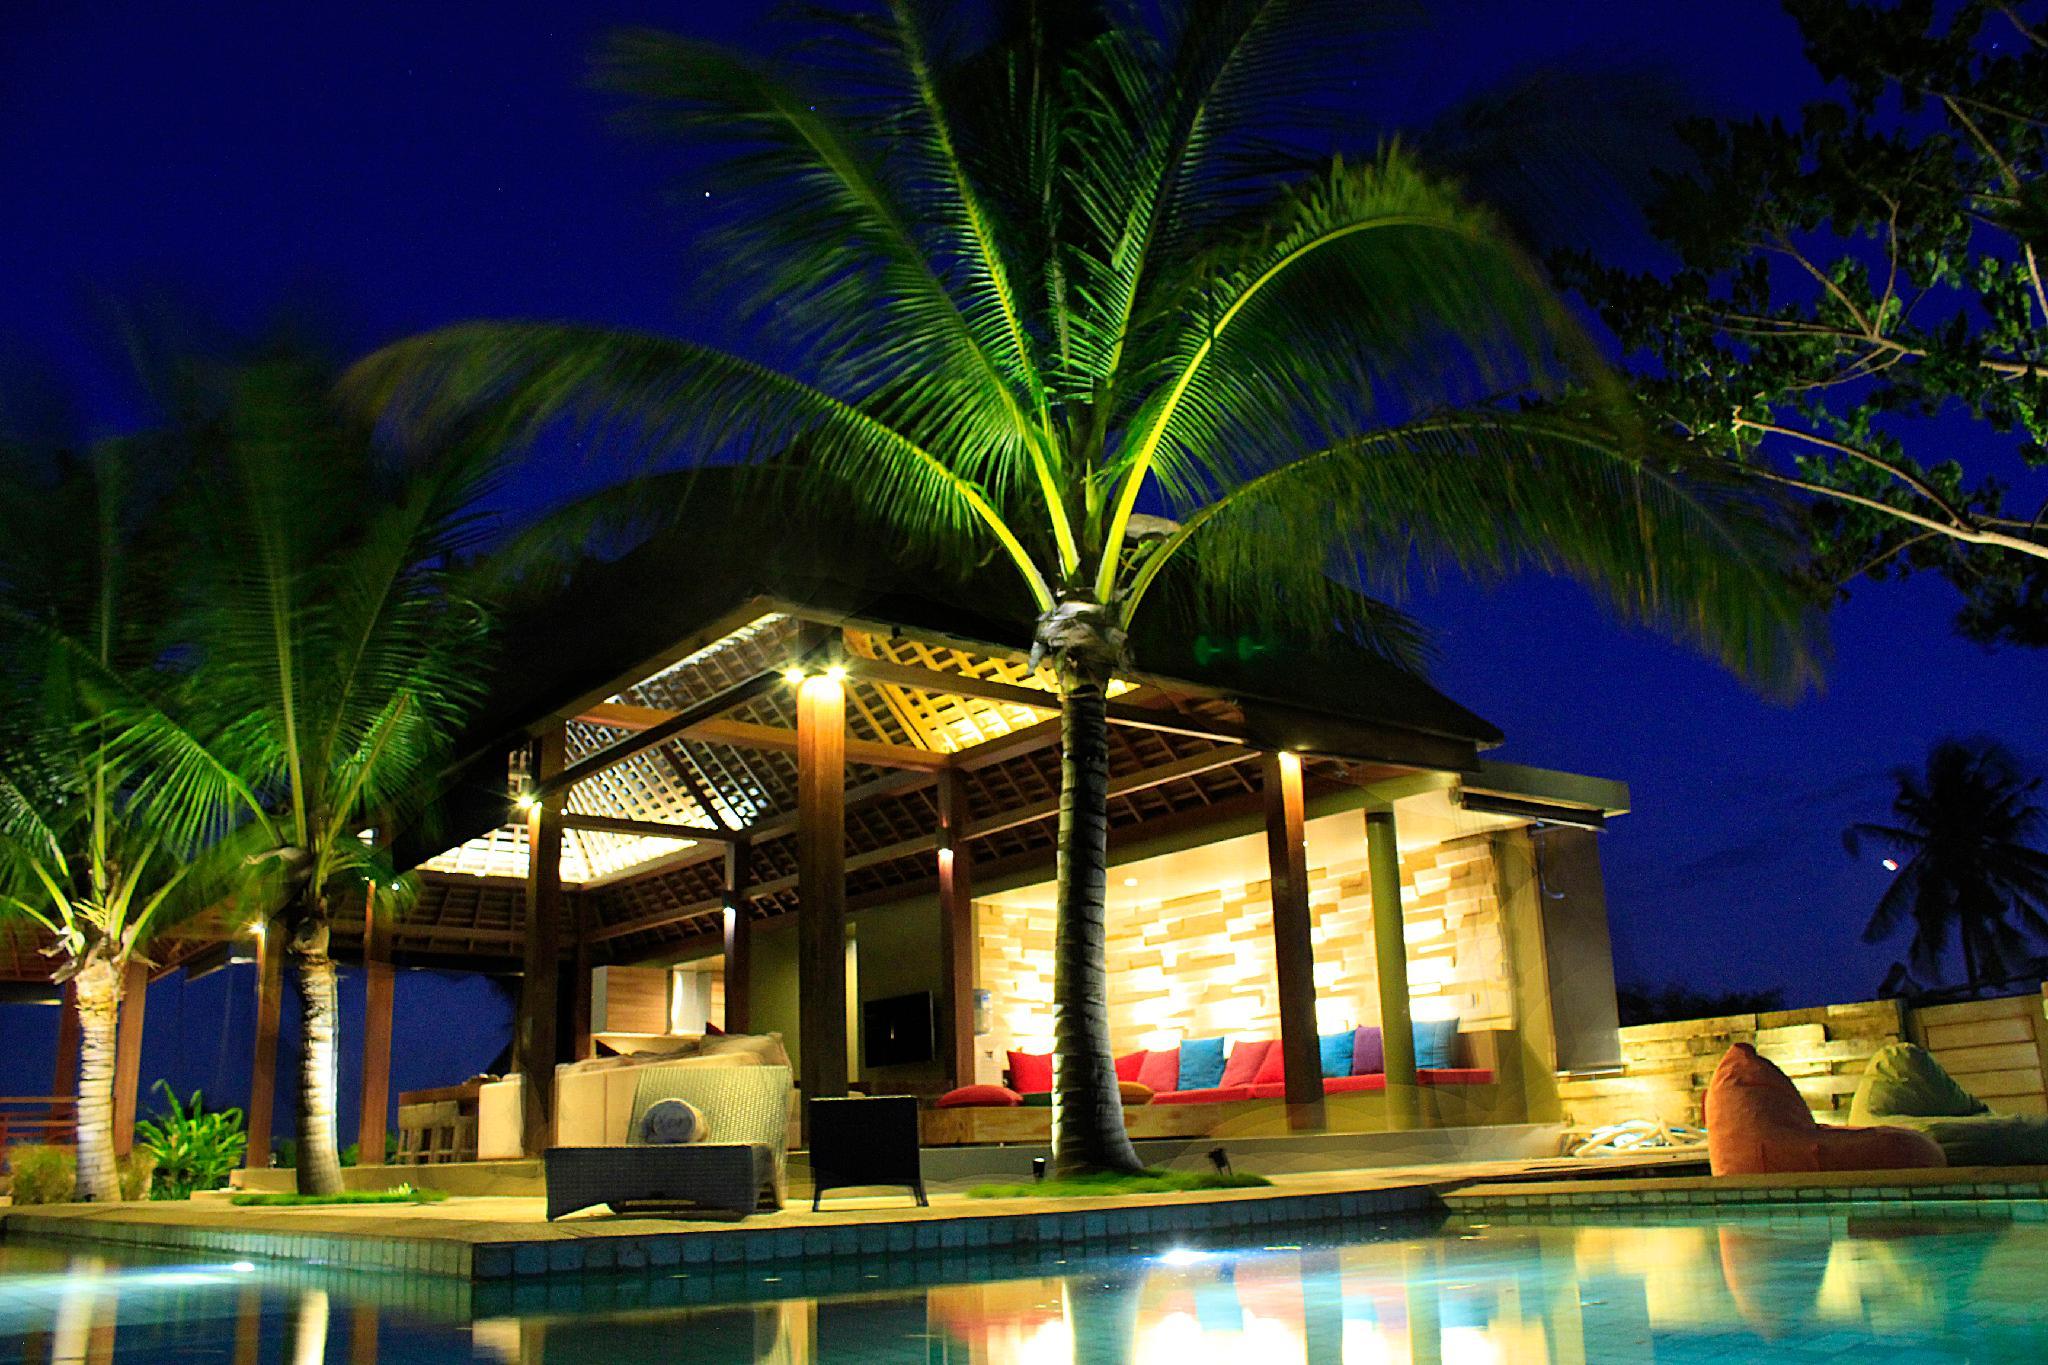 Hotel De Cliff Villa - Jalan Raya - Lombok